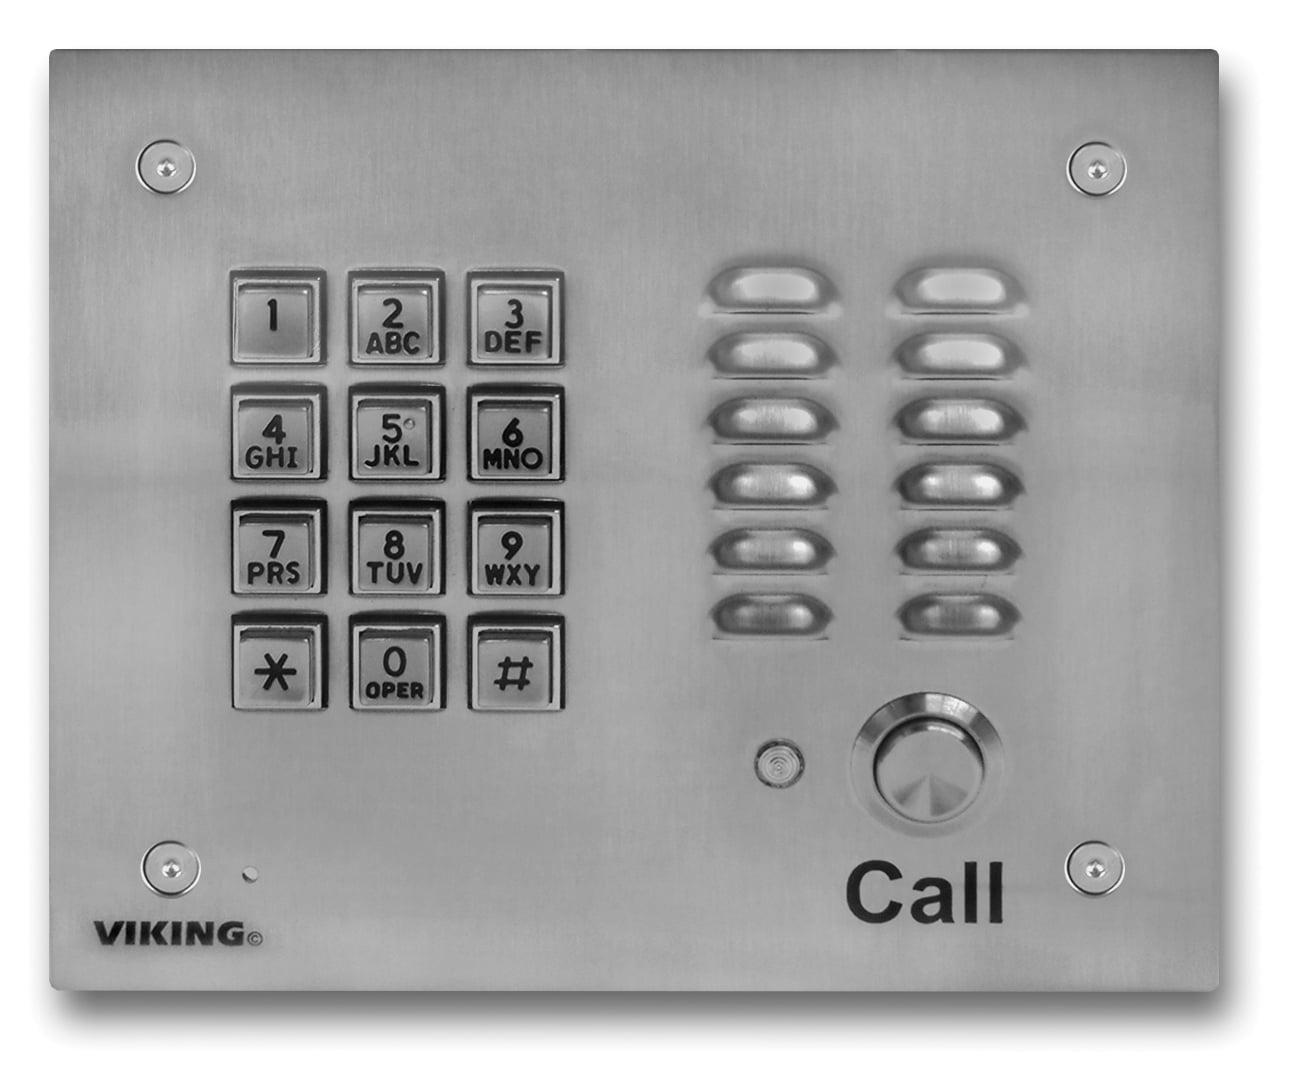 Viking Electronics SS Handsfree Phone W/ Key Pad